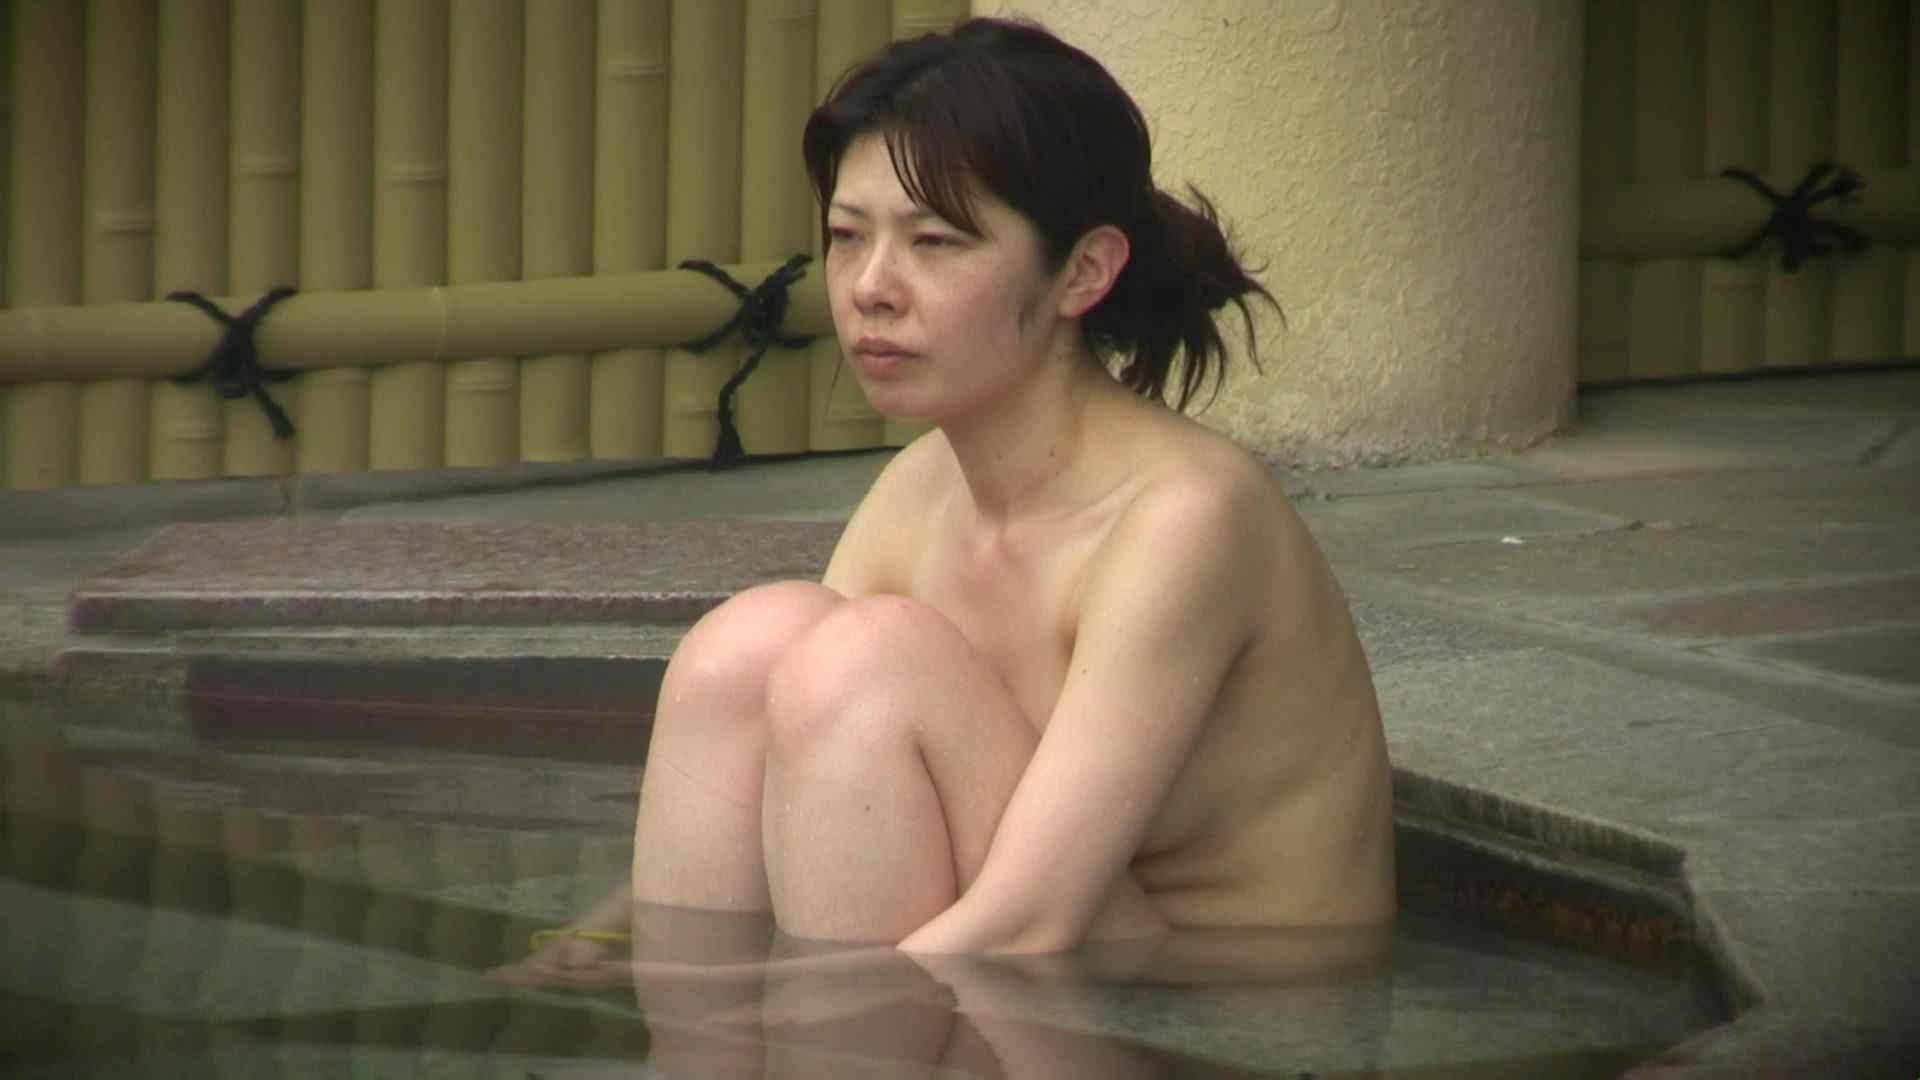 Aquaな露天風呂Vol.676 盗撮シリーズ | 露天風呂編  83PIX 31